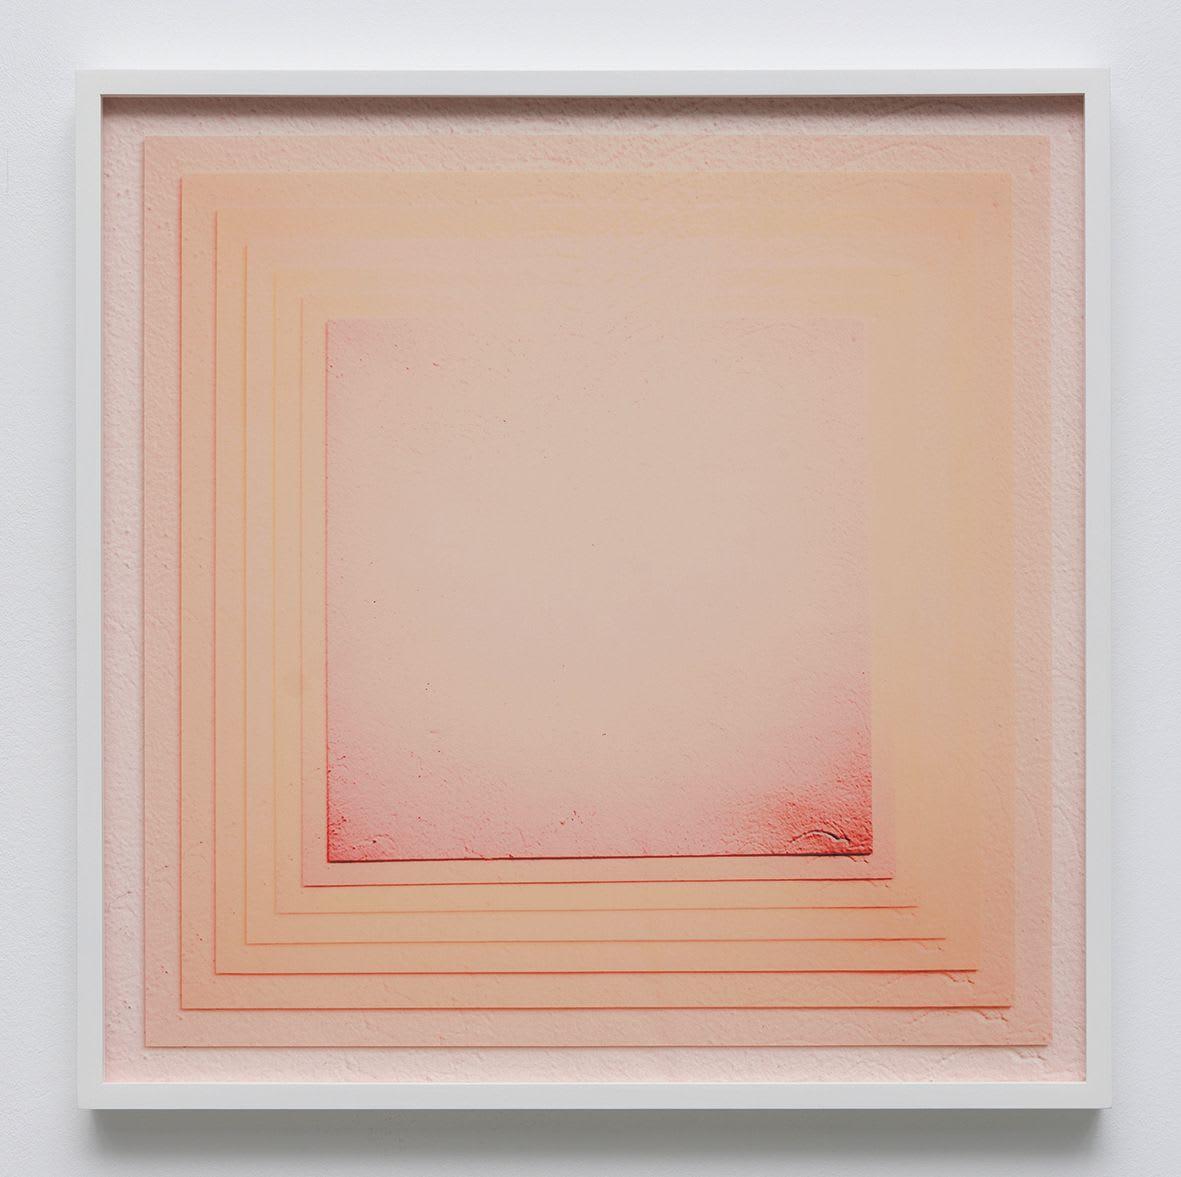 "<span class=""link fancybox-details-link""><a href=""/exhibitions/133/works/artworks9446/"">View Detail Page</a></span><div class=""artist""><strong>Alexander Gutke</strong></div><div class=""title""><em>9 to 5 Stormgatan 4 I</em>, 2012</div><div class=""medium"">ink jet print</div><div class=""dimensions"">framed: 50 x 50 cm</div>"